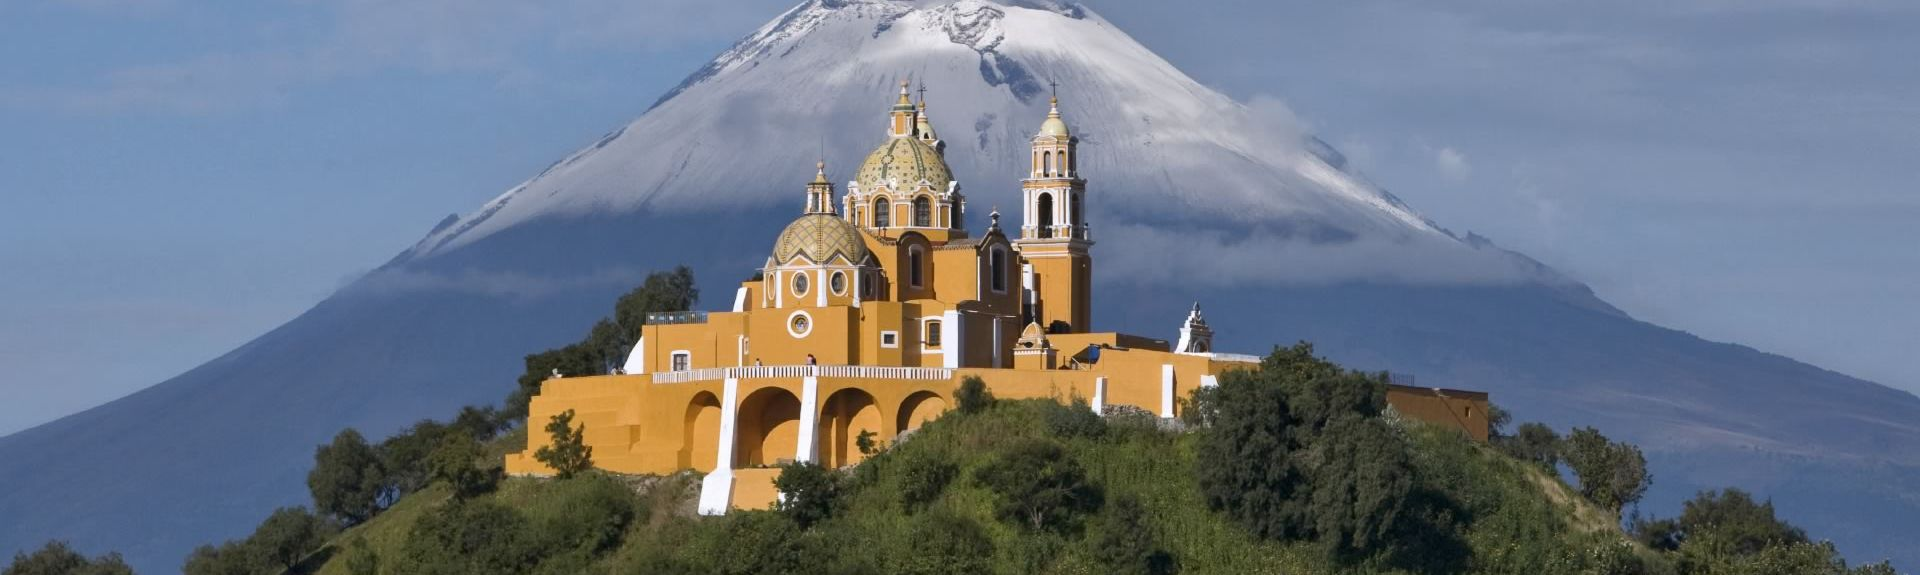 Cholula, Puebla, Messico